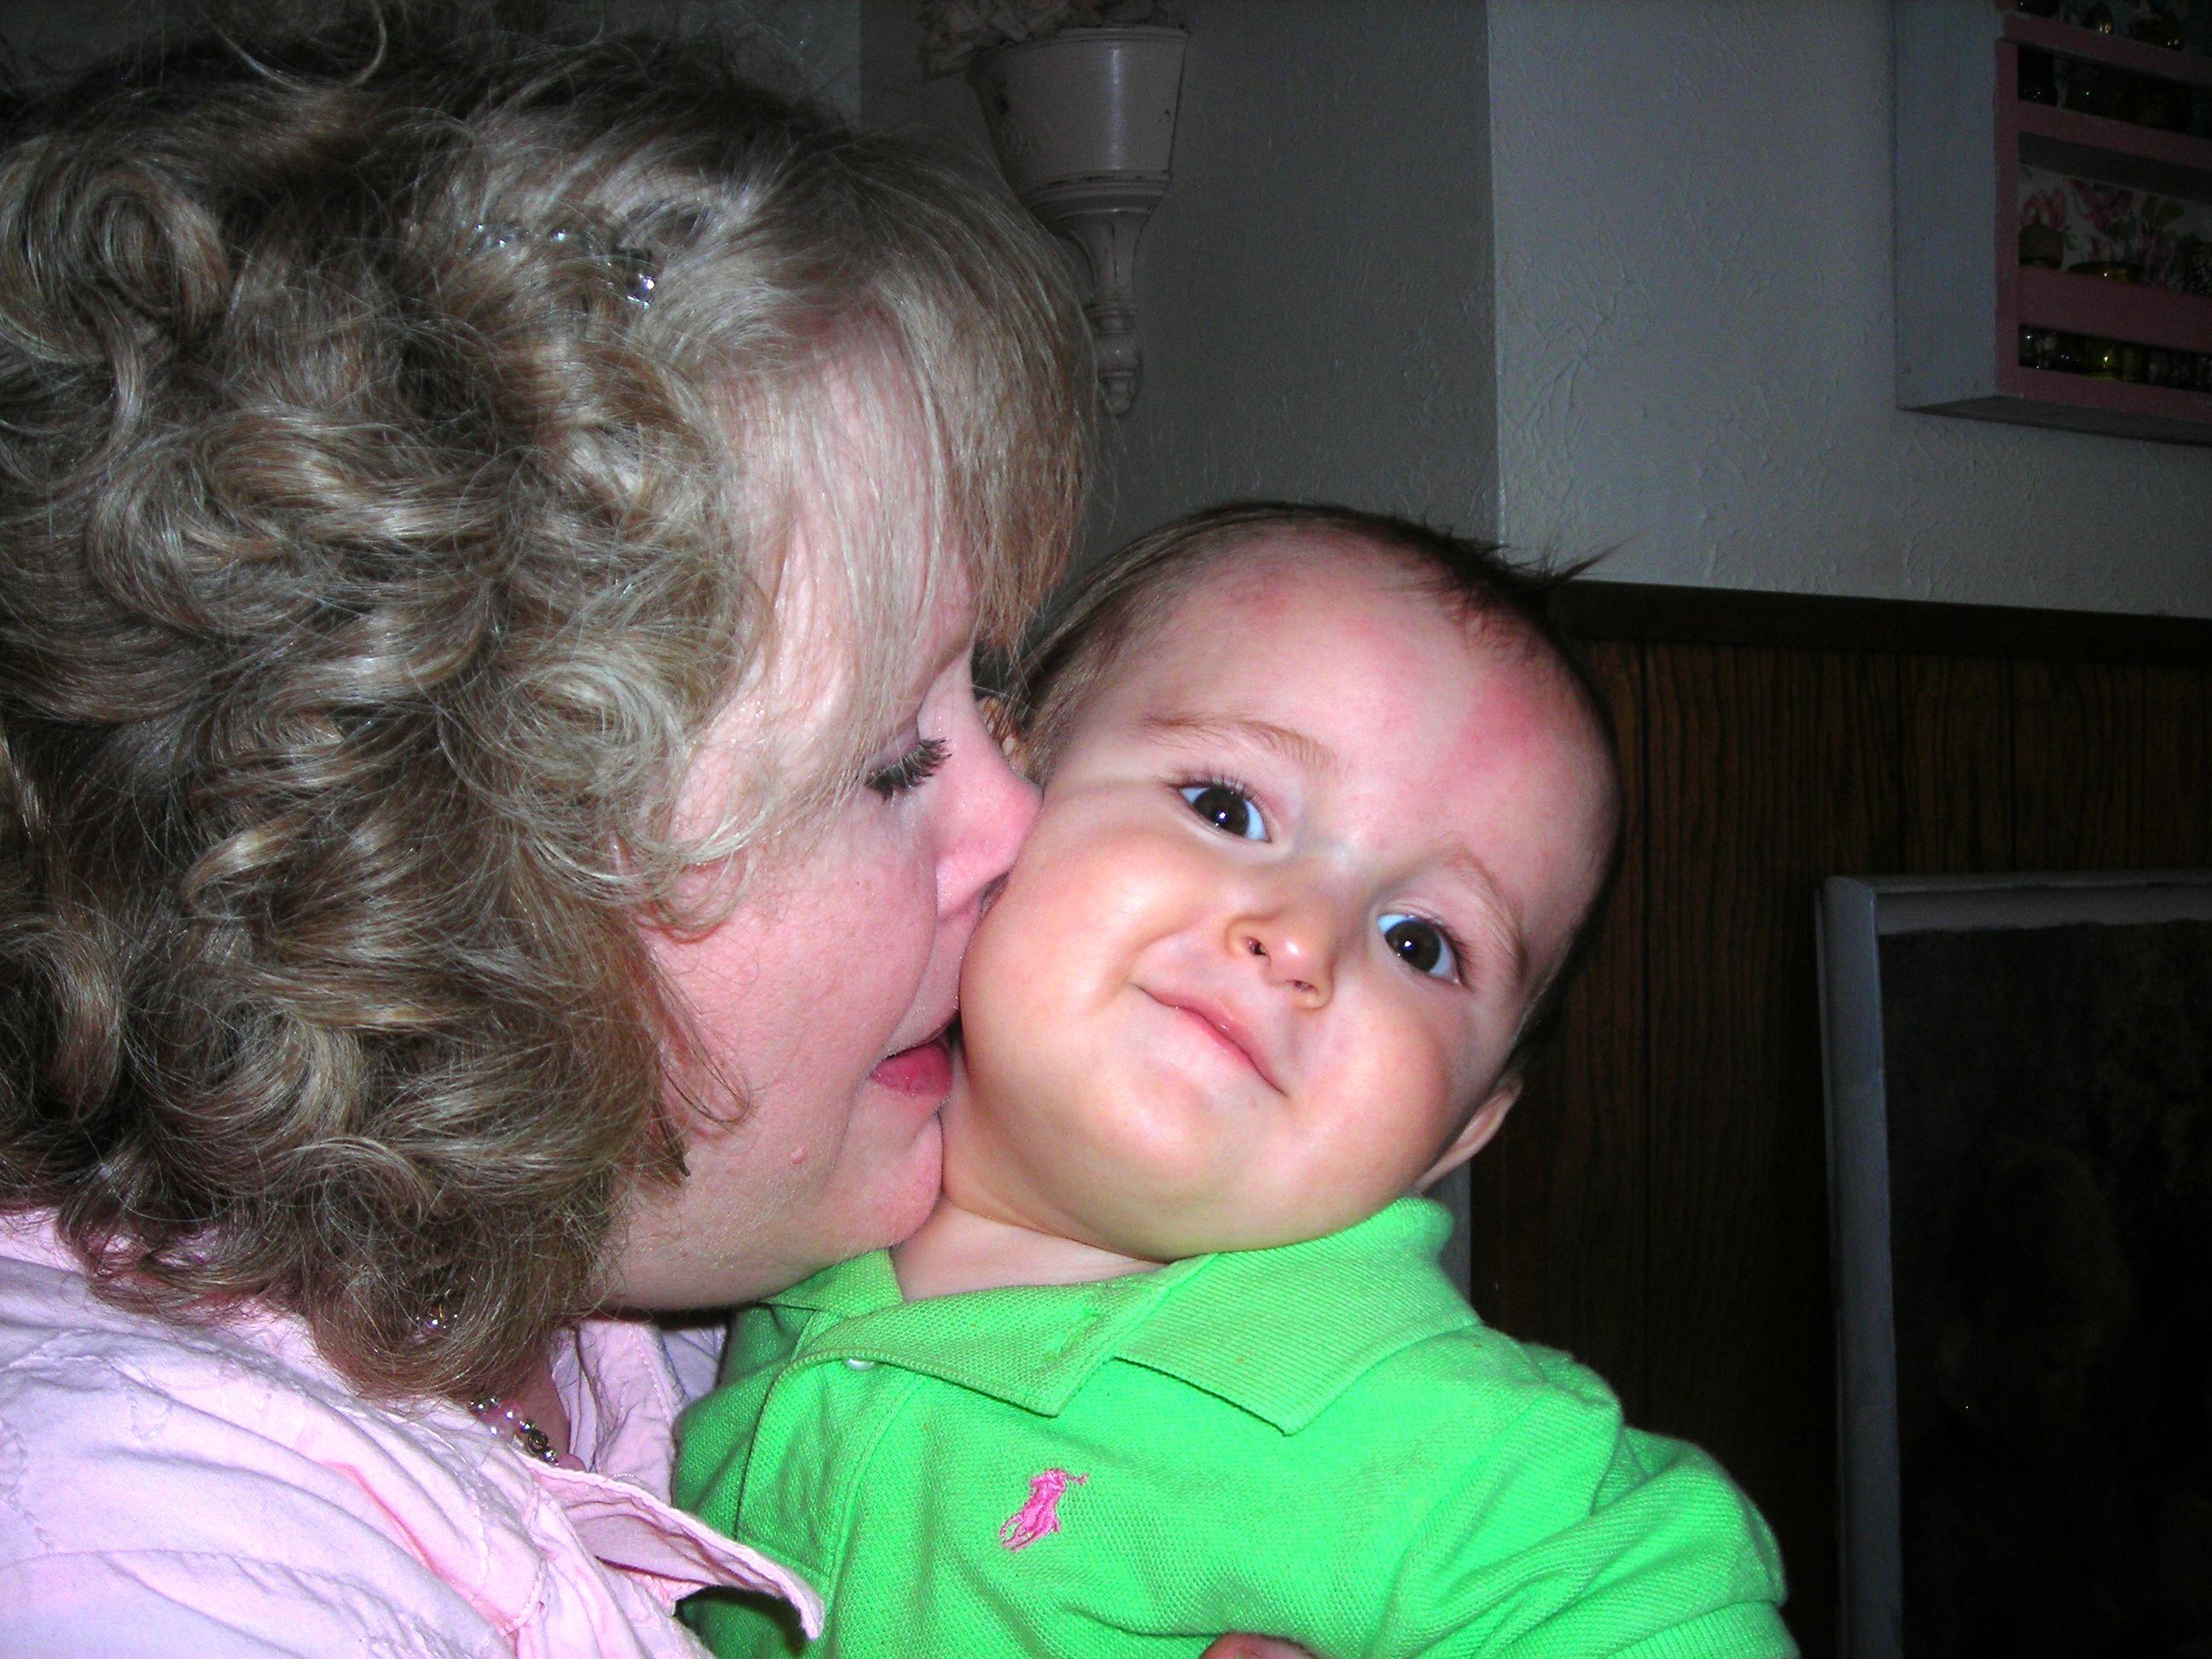 grandmommy steals some sweet sugar